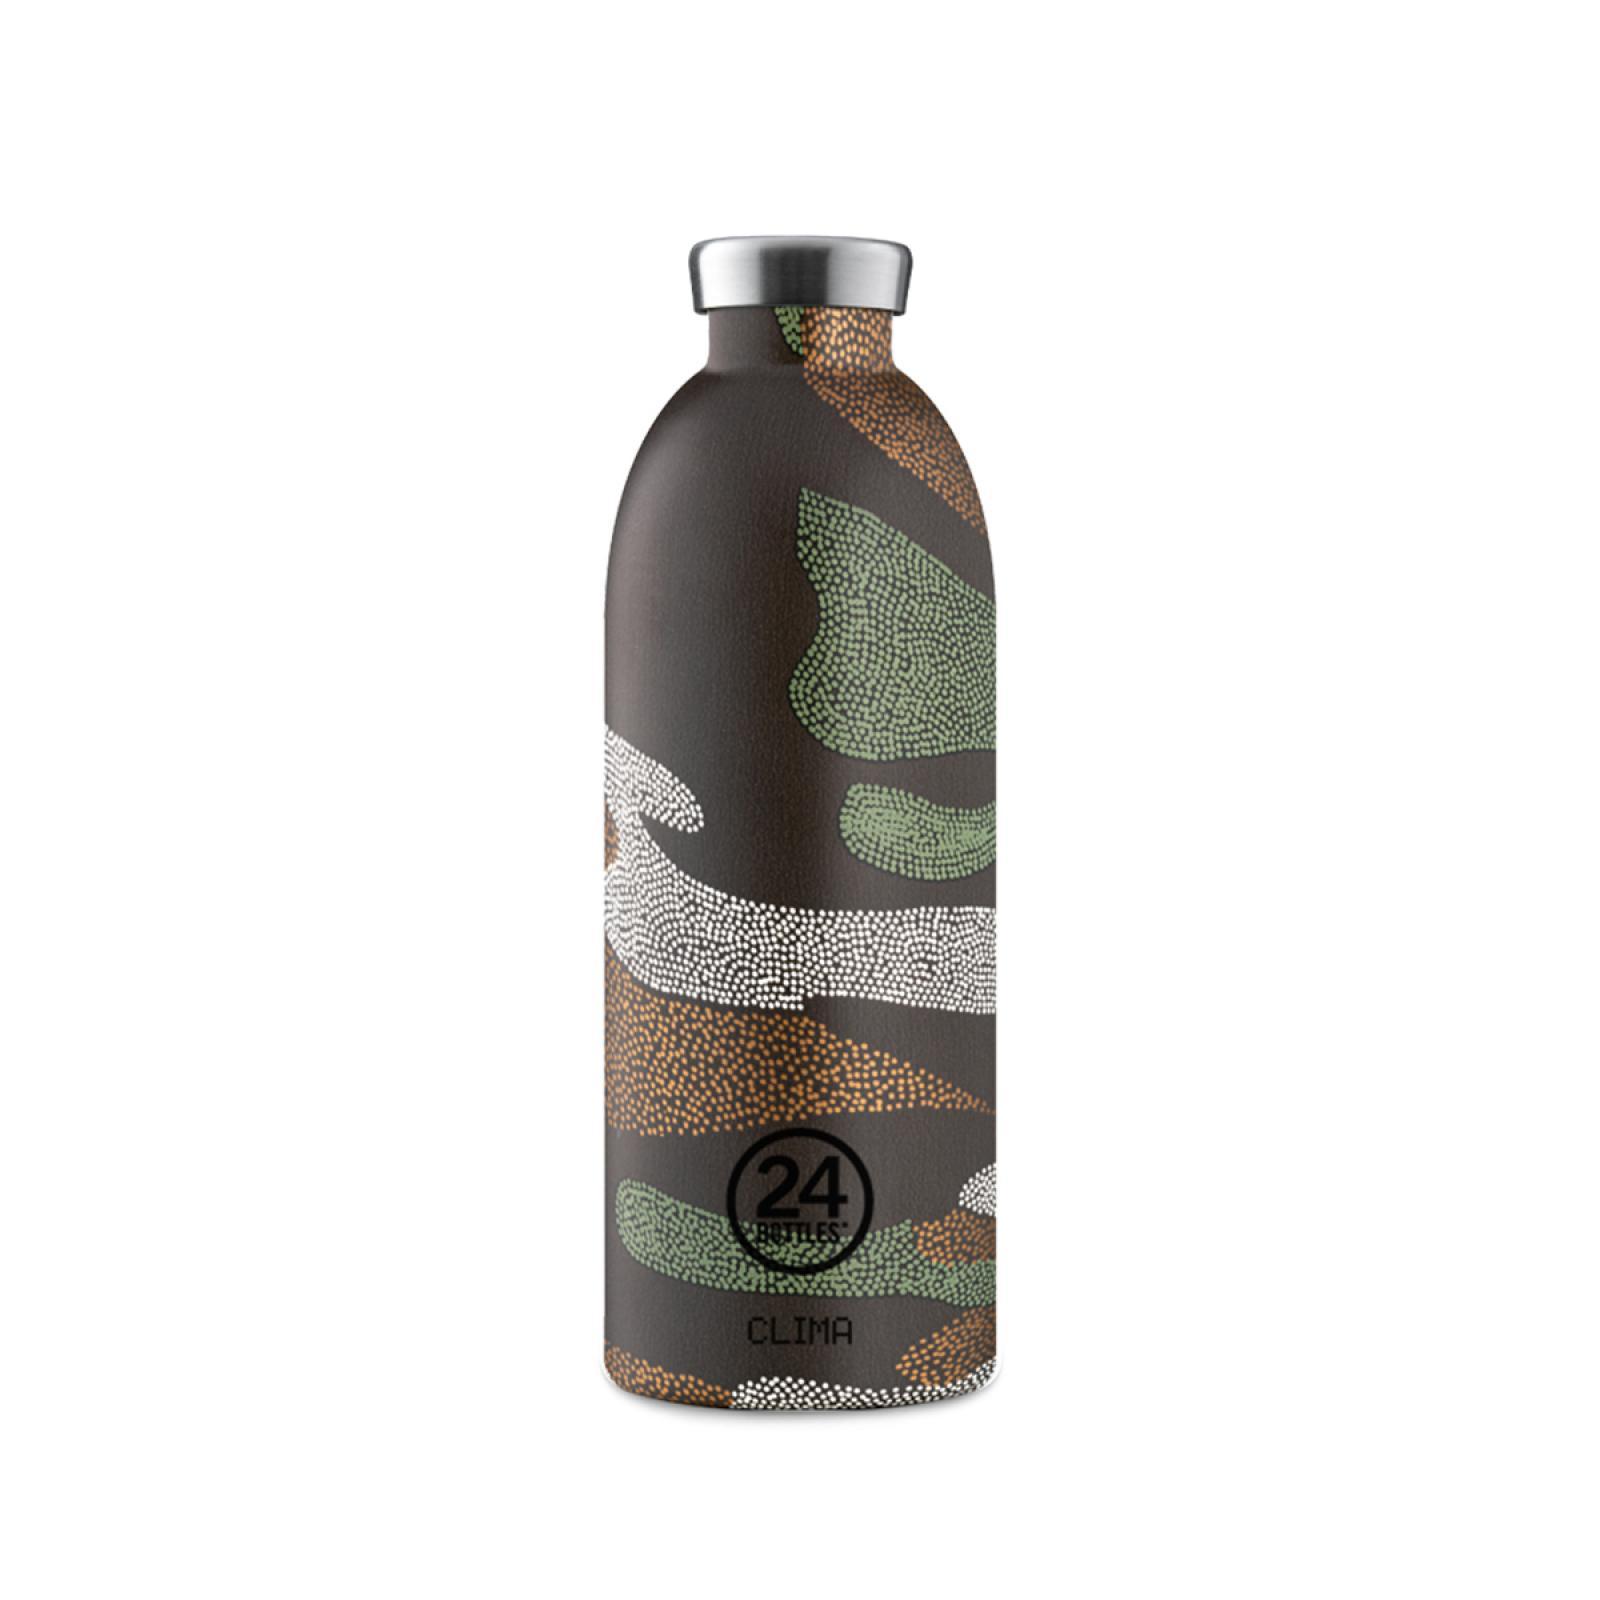 24 Bottles Clima Bottle Camo Zone 850 ml - 1